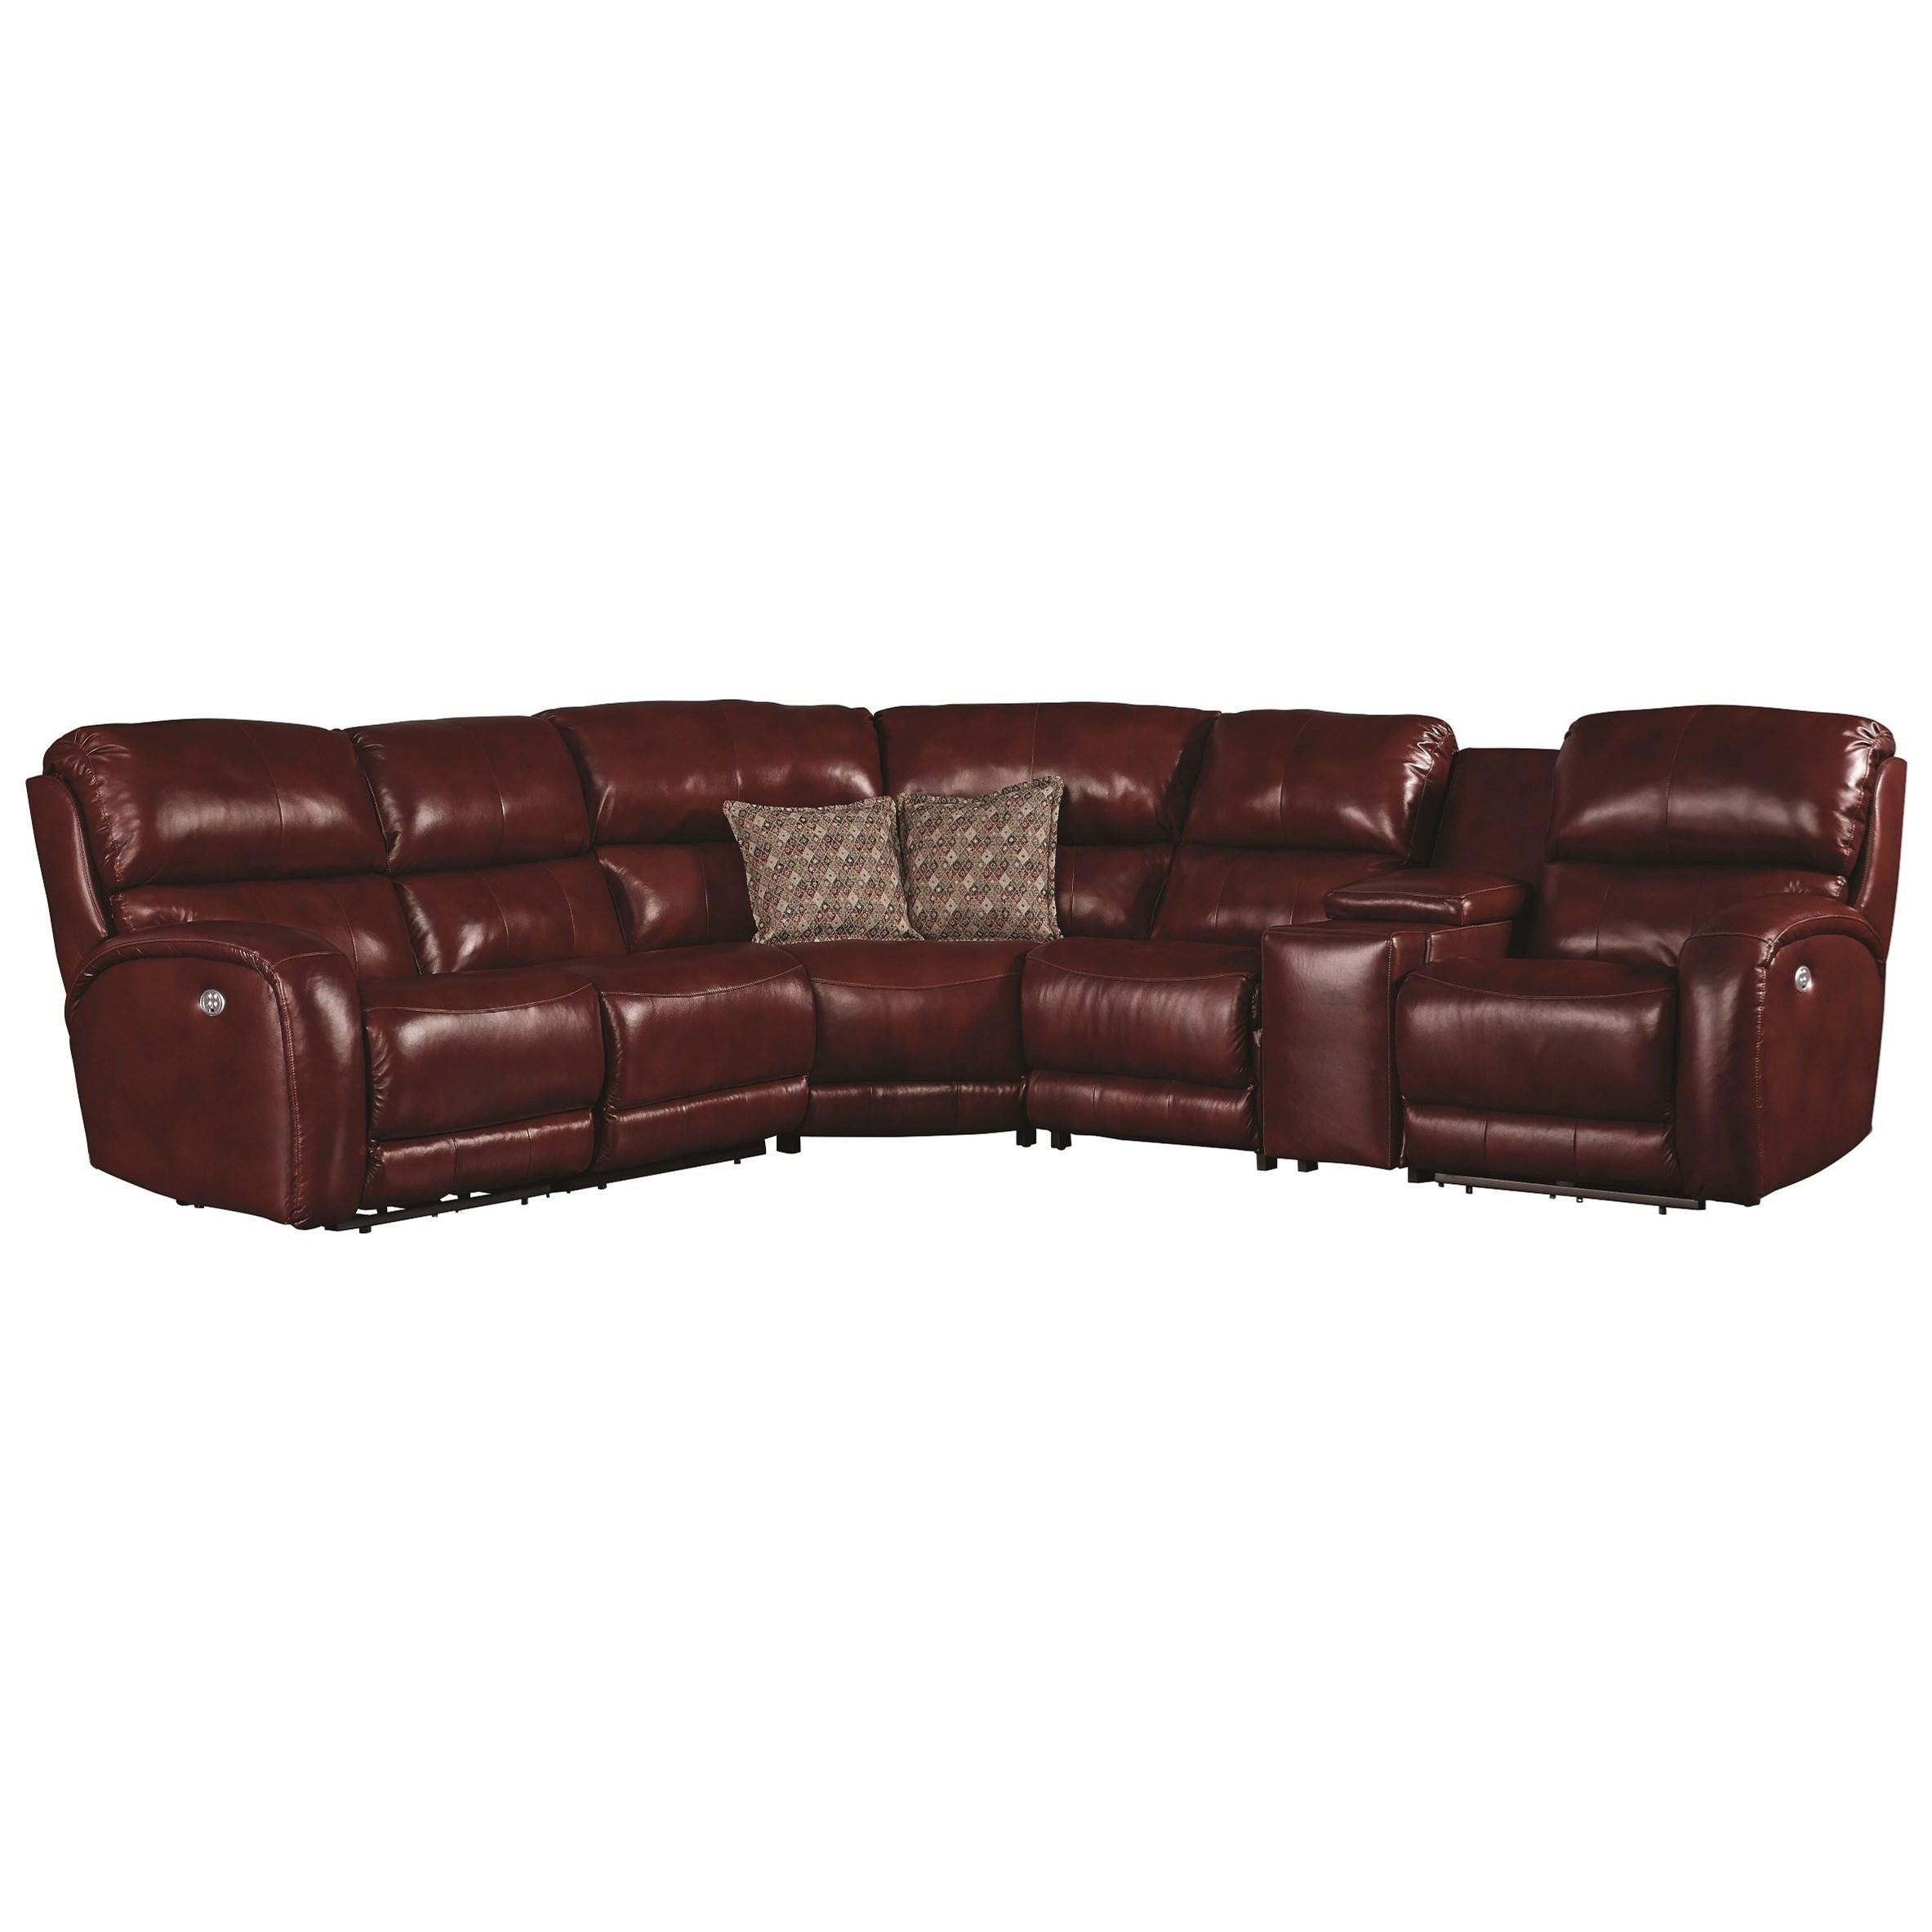 Fandango Power Headrest Reclining Sofa by Southern Motion at Pilgrim Furniture City